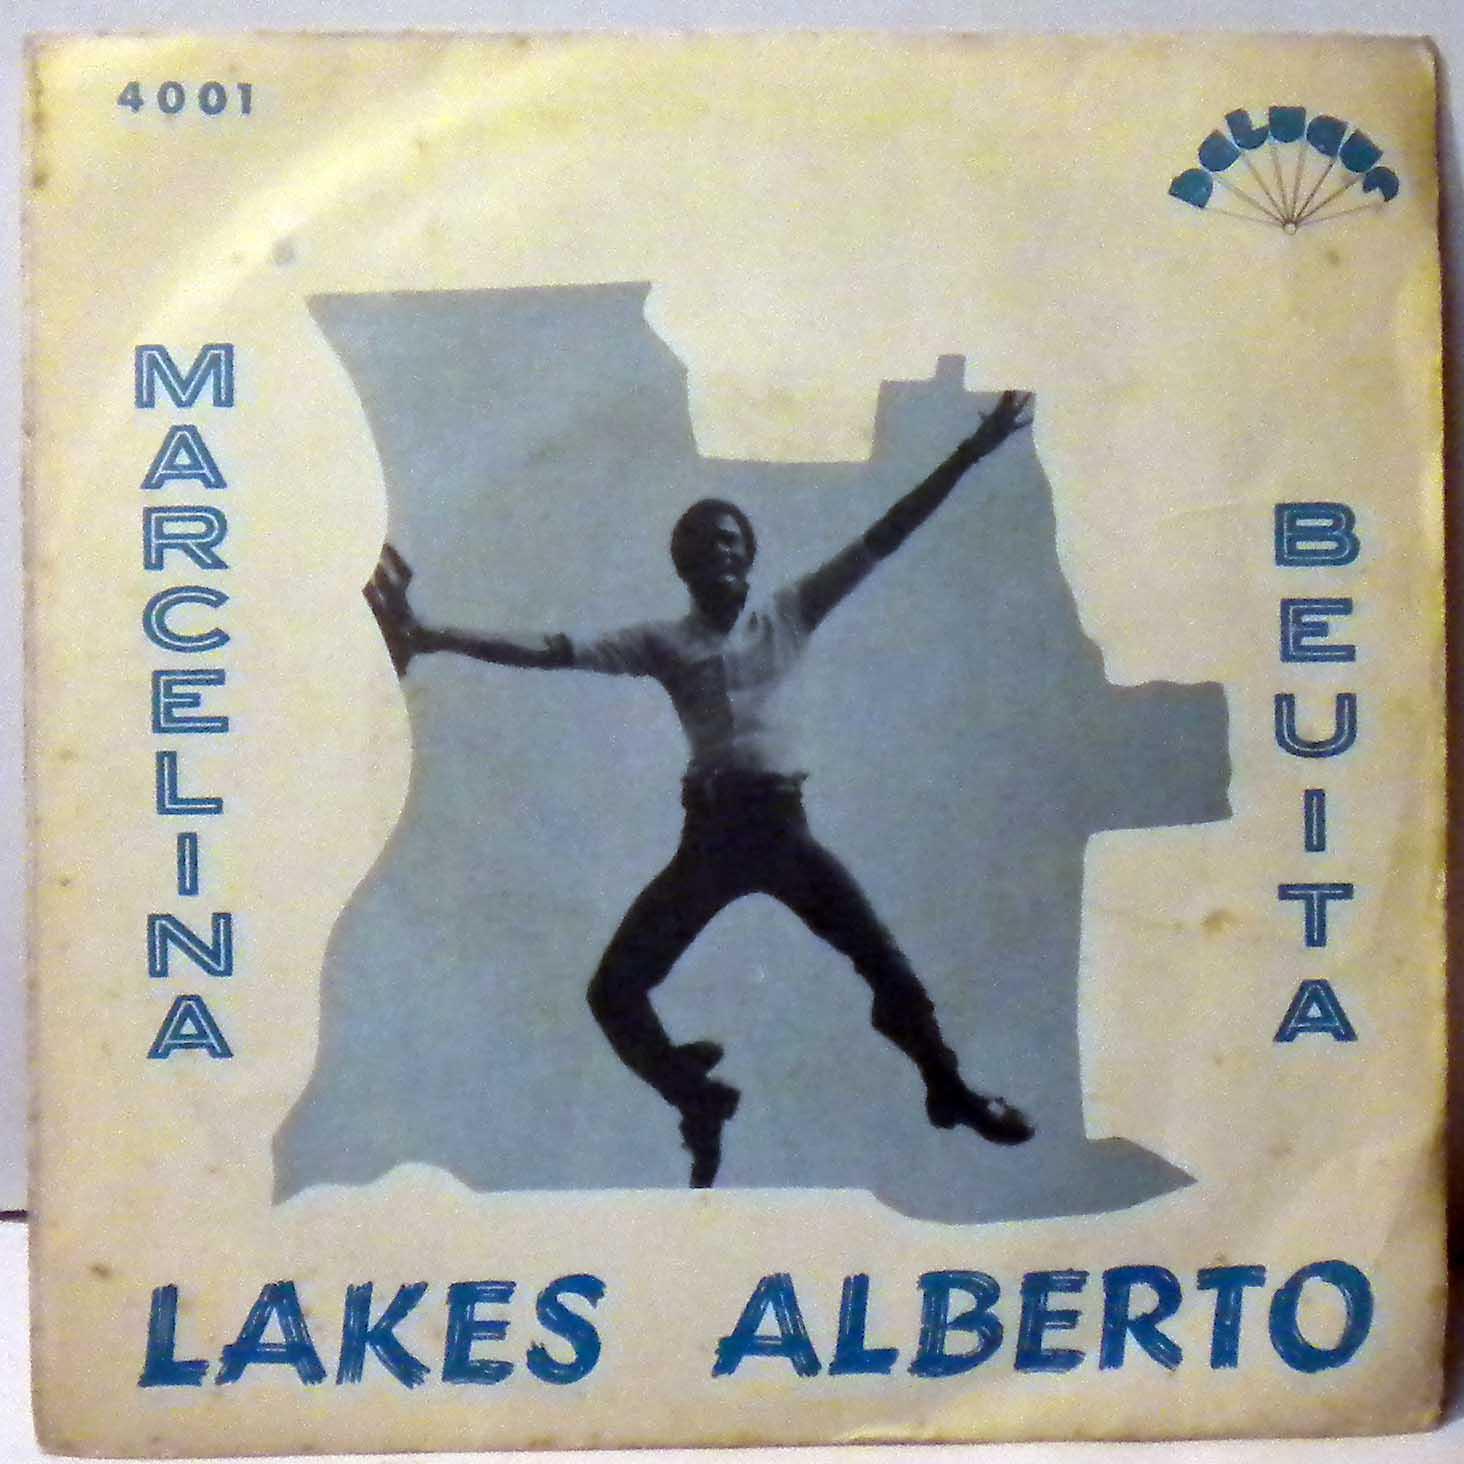 LAKES ALBERTO - Marcelina / Beuita - 7inch (SP)